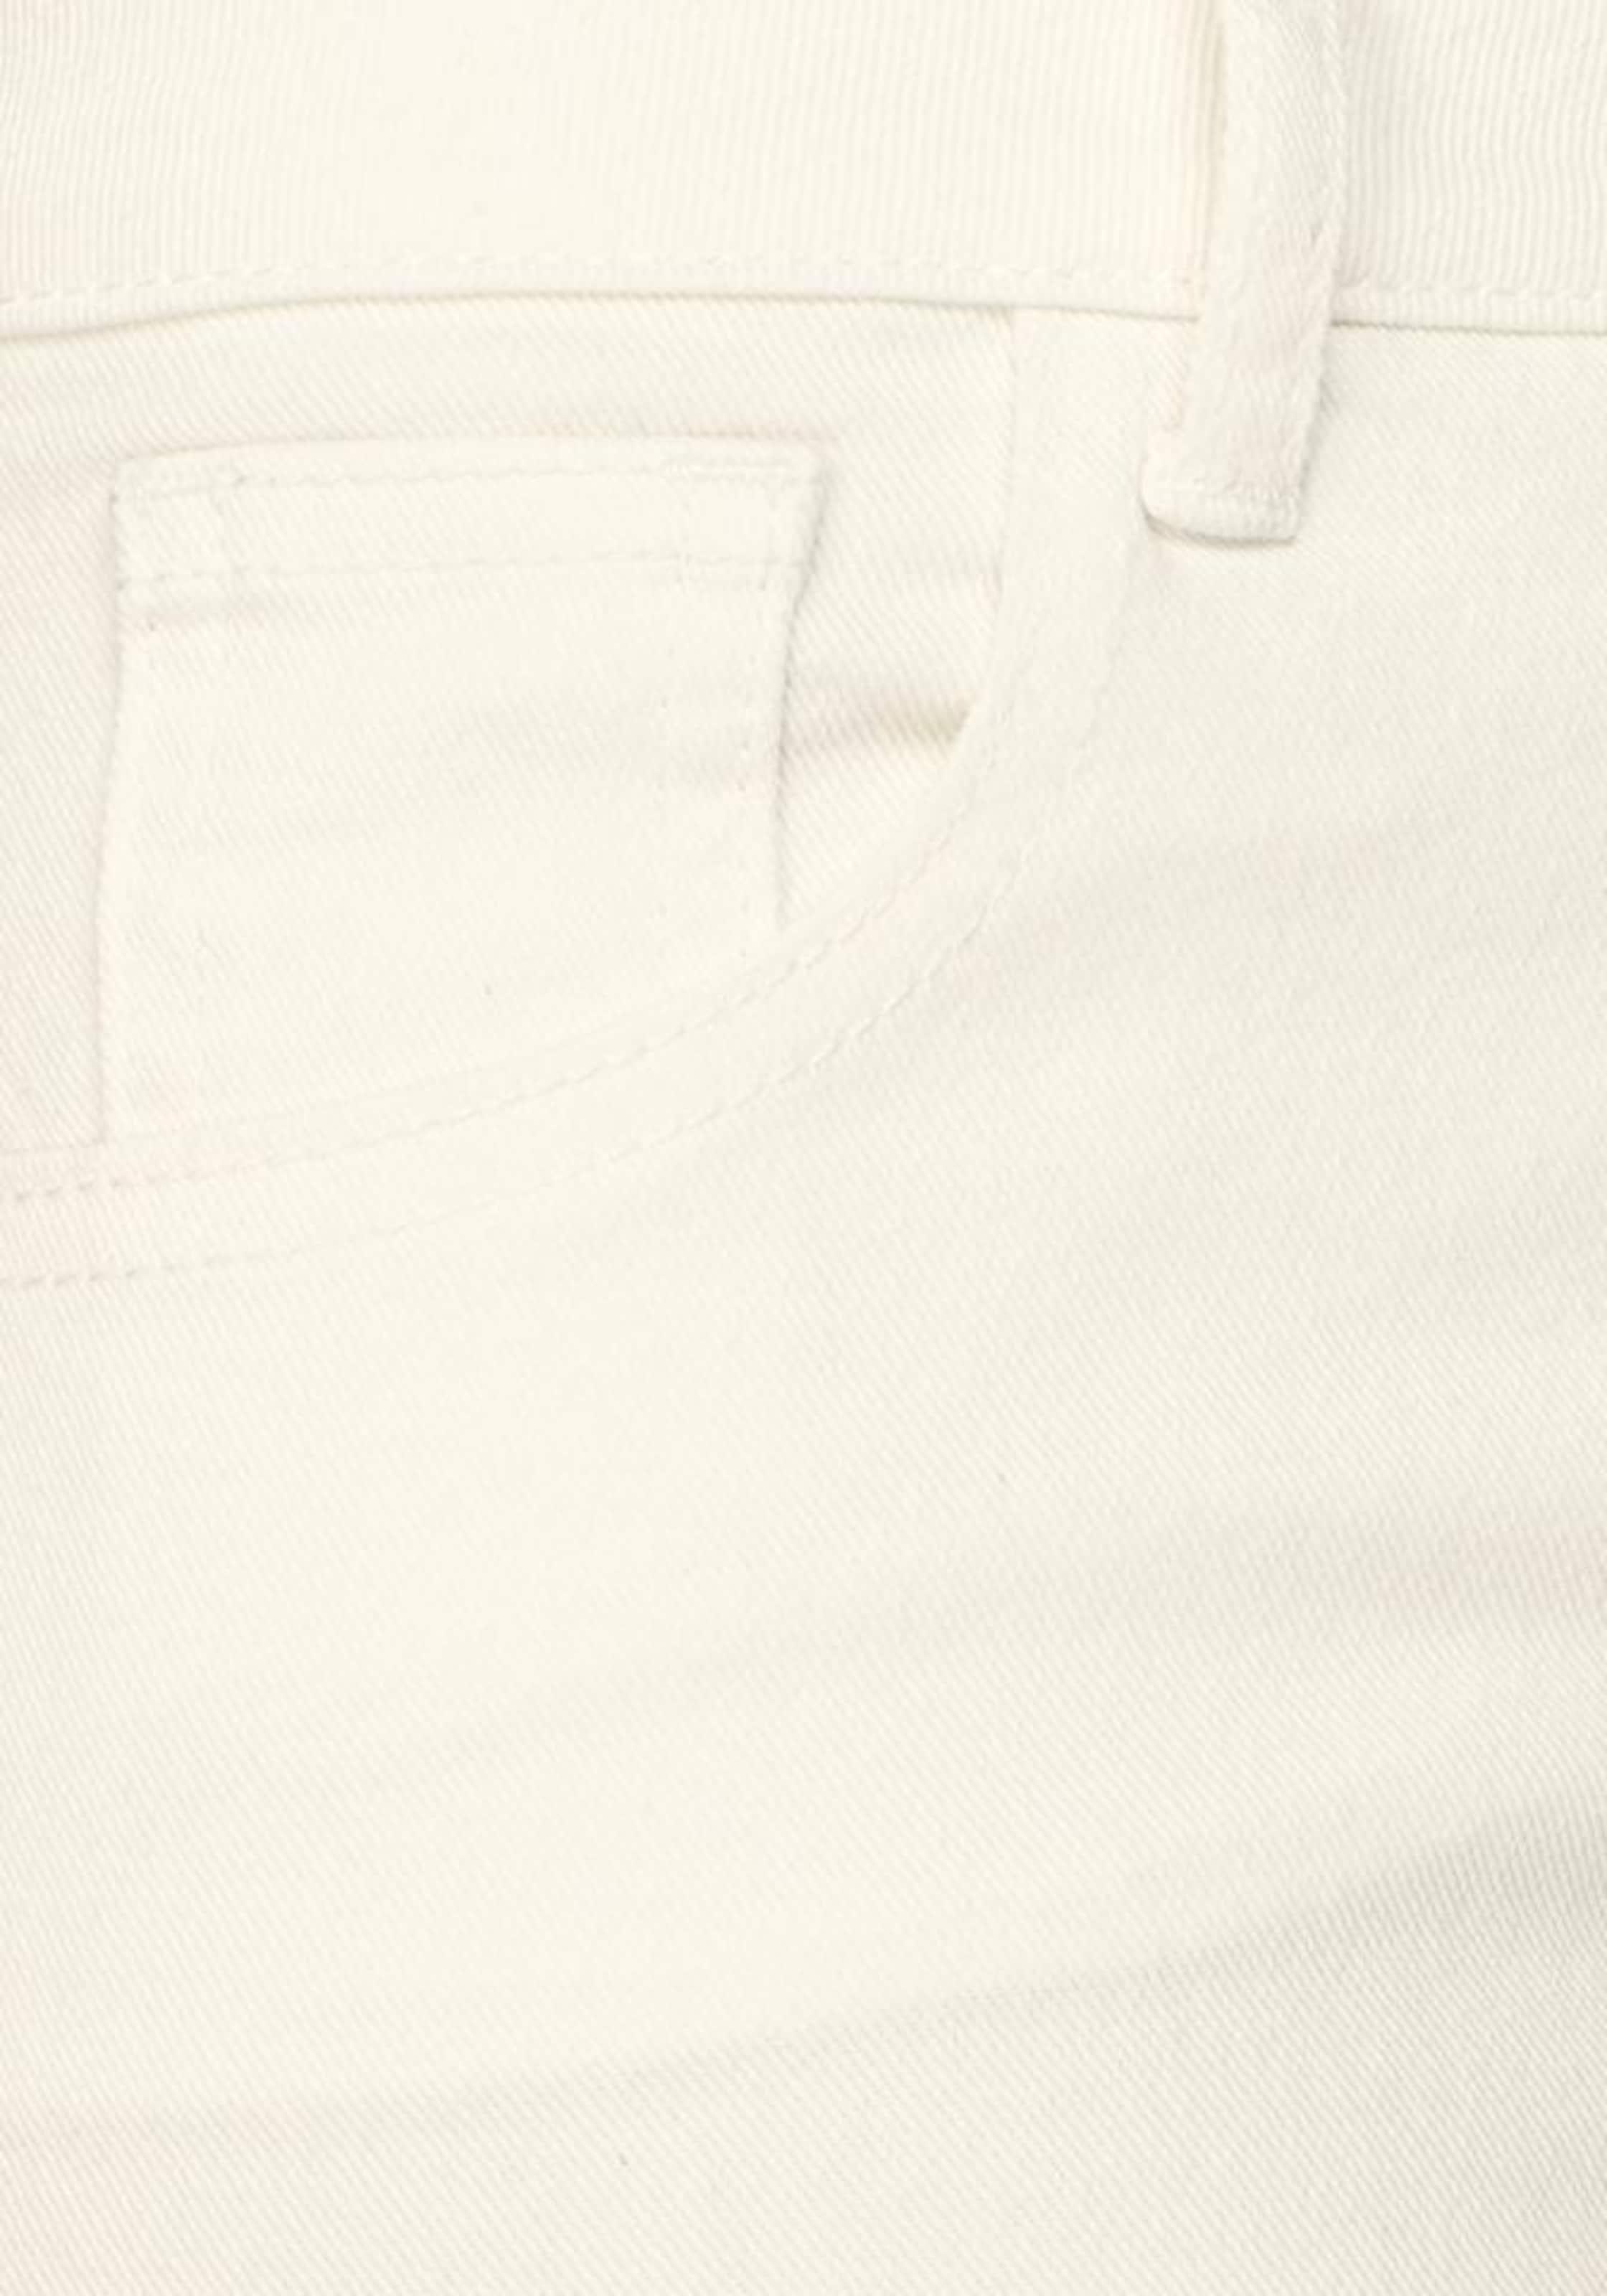 Bootcut Arizona In White Denim jeans v6Yf7bgy